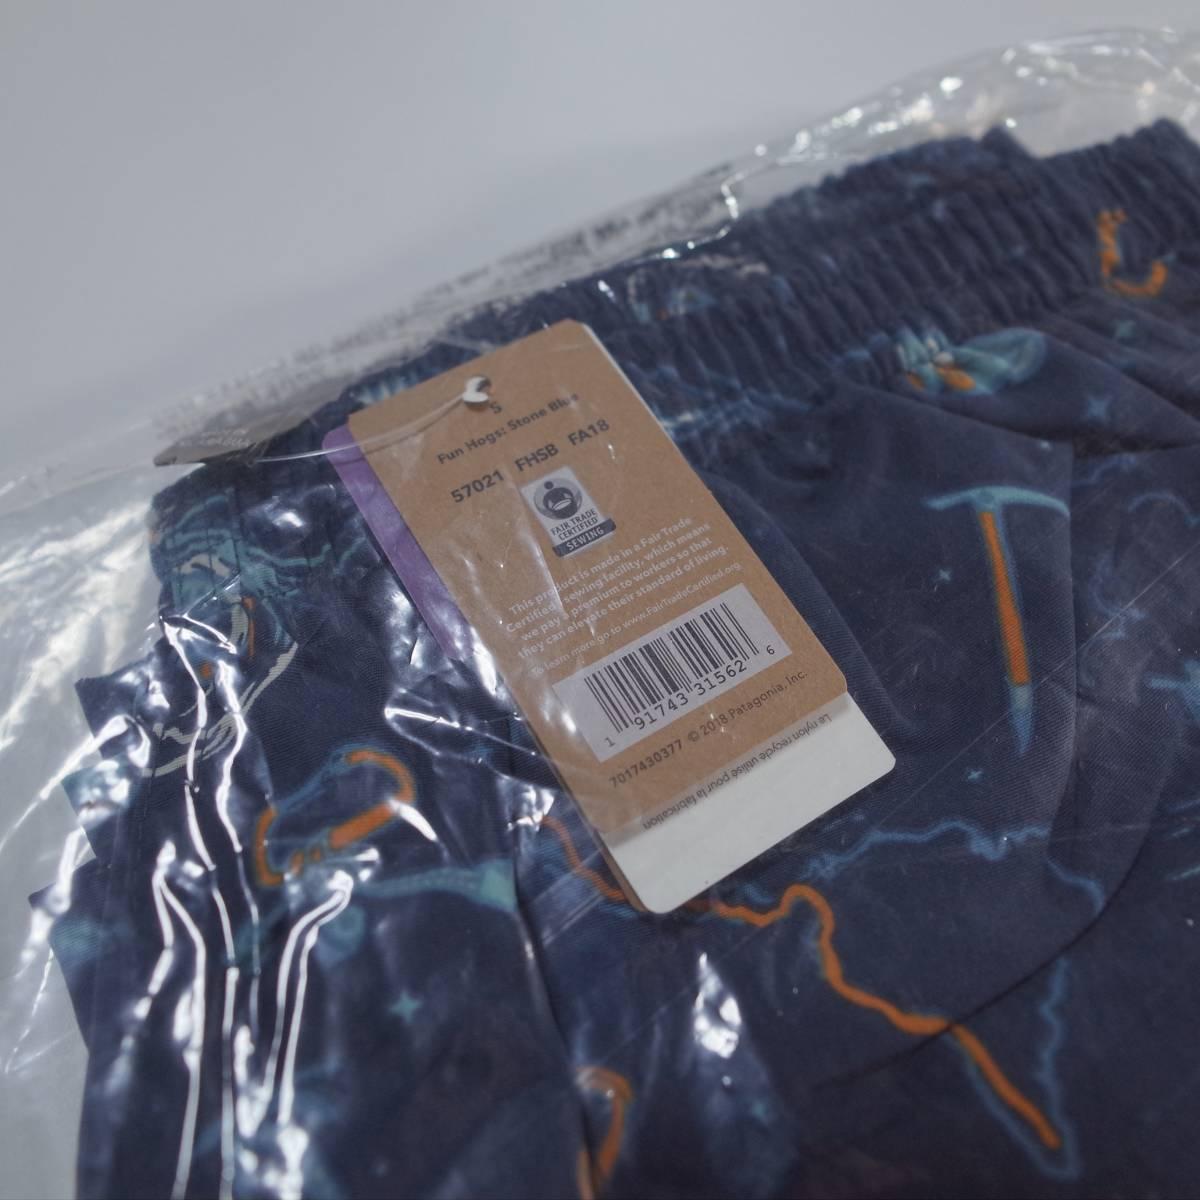 patagonia パタゴニア mens baggies shorts メンズ バギーズ ショーツ Fun Hogs: Stone Blue (FHSB) S 新品未使用 36周年限定柄 新カラー